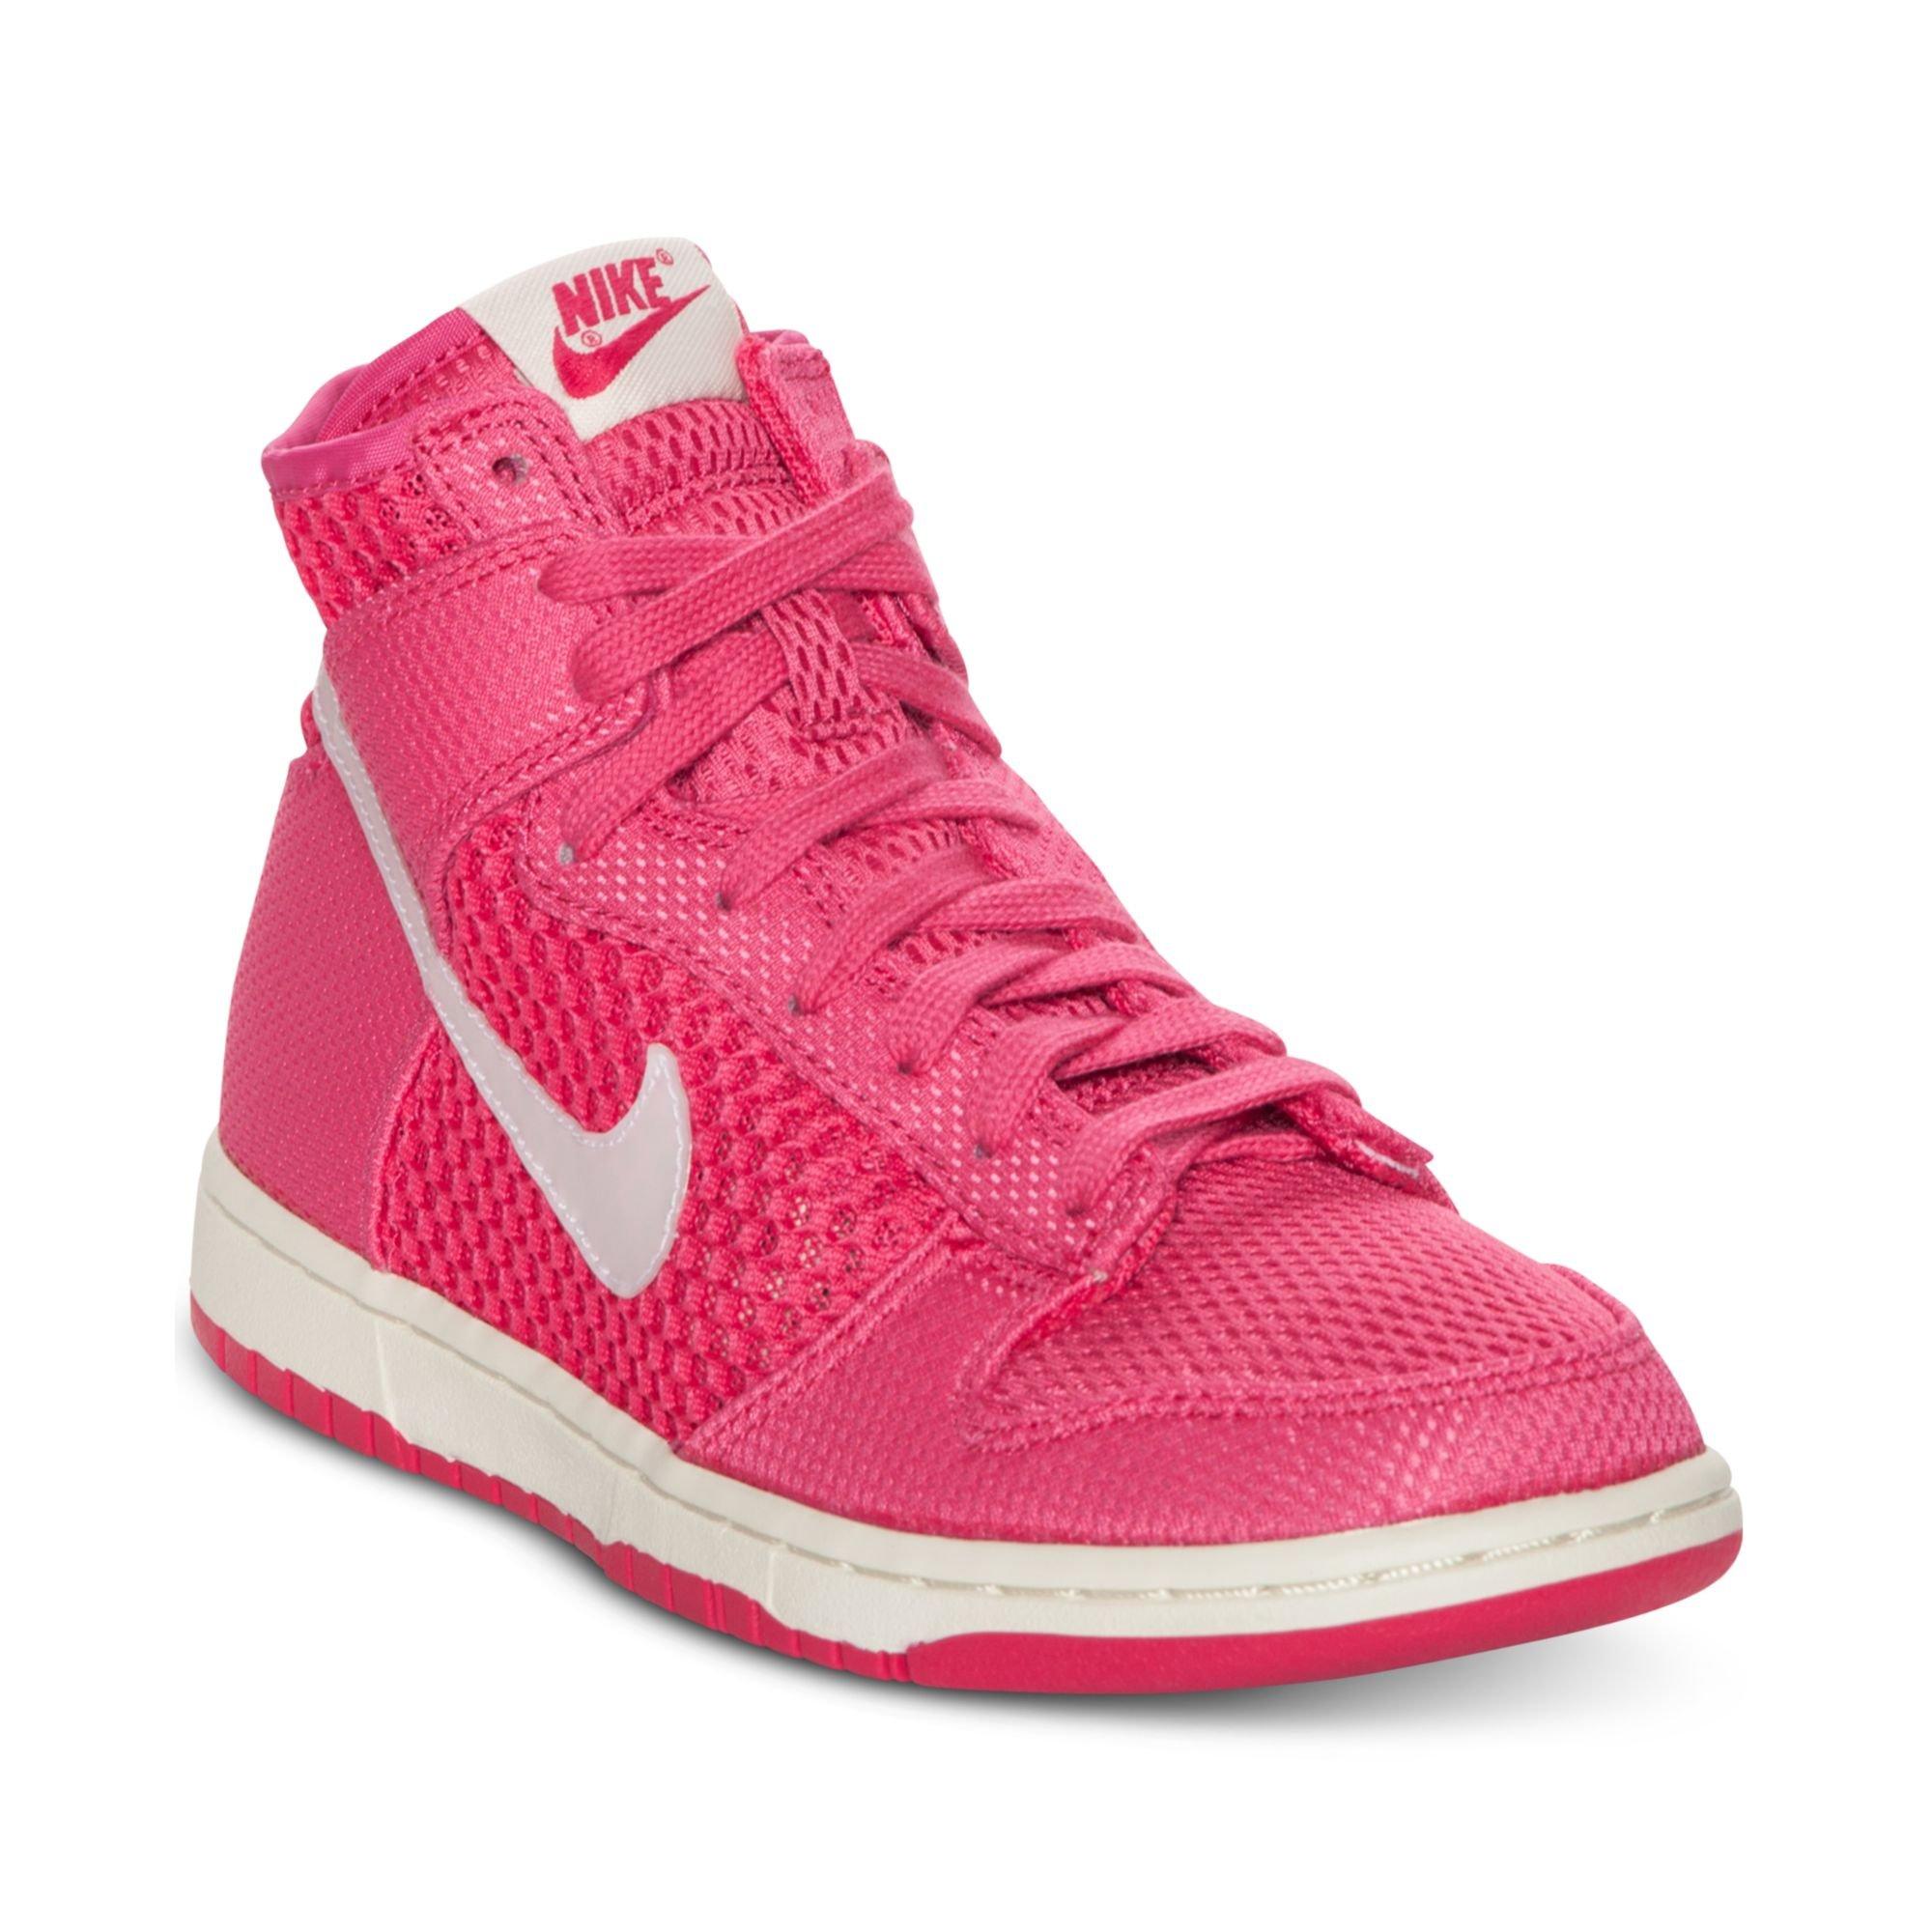 Nike Dunk High Skinny Women S Casual Shoes